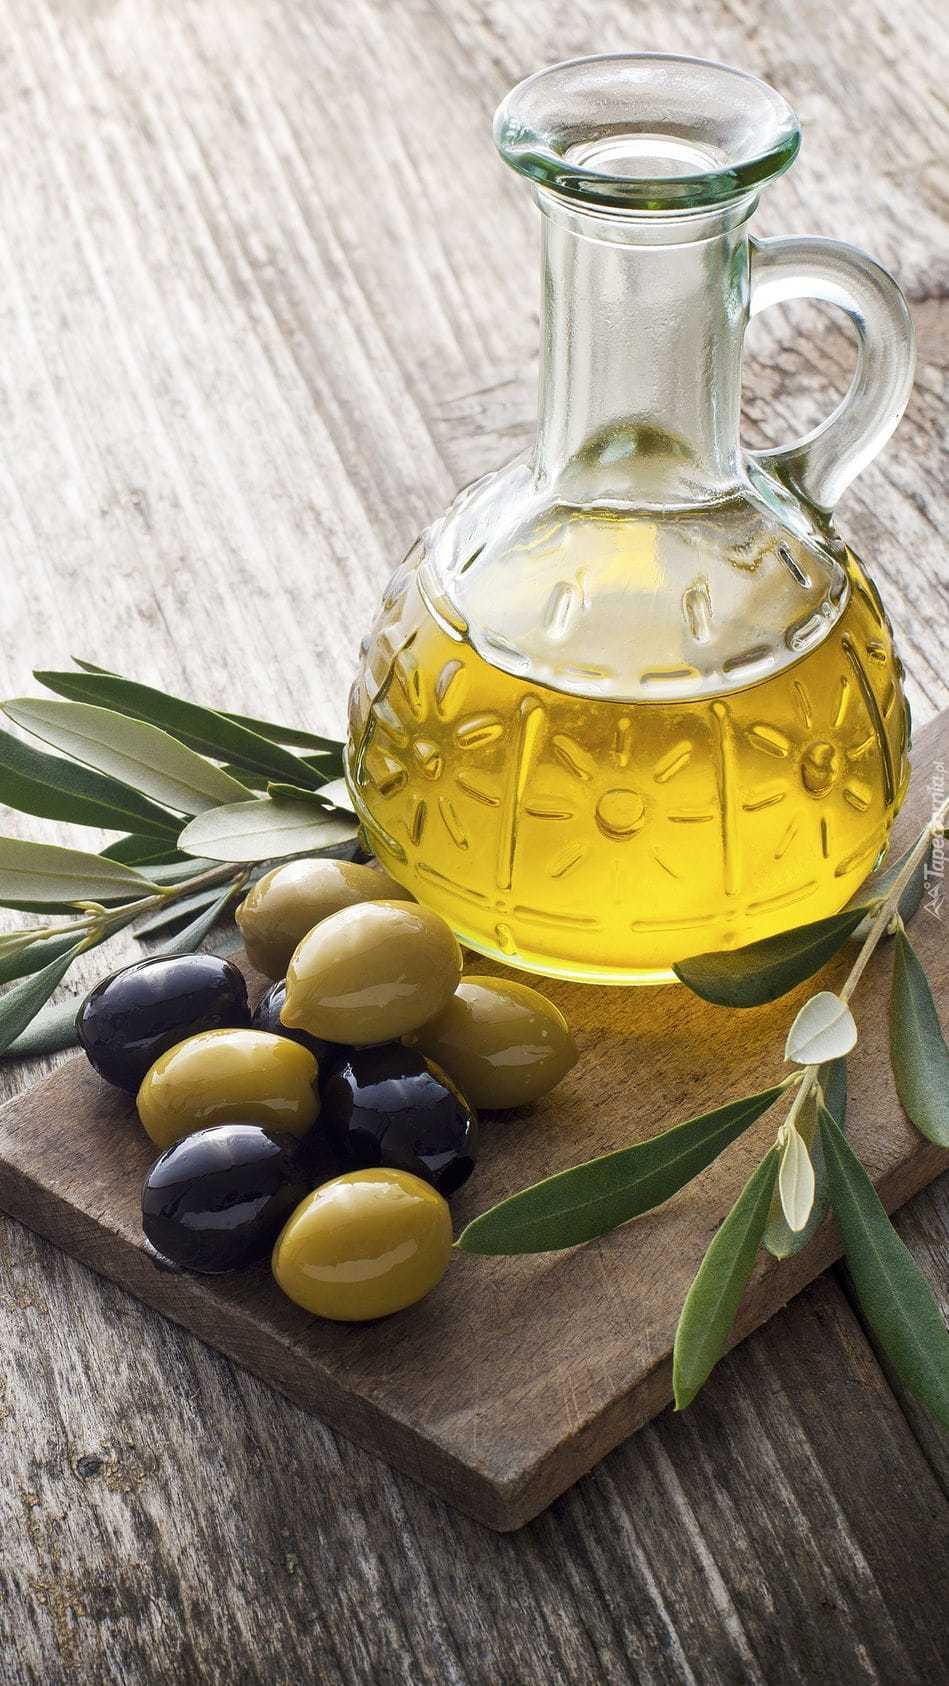 Oliwa z oliwek w dzbanuszku na desce obok oliwek